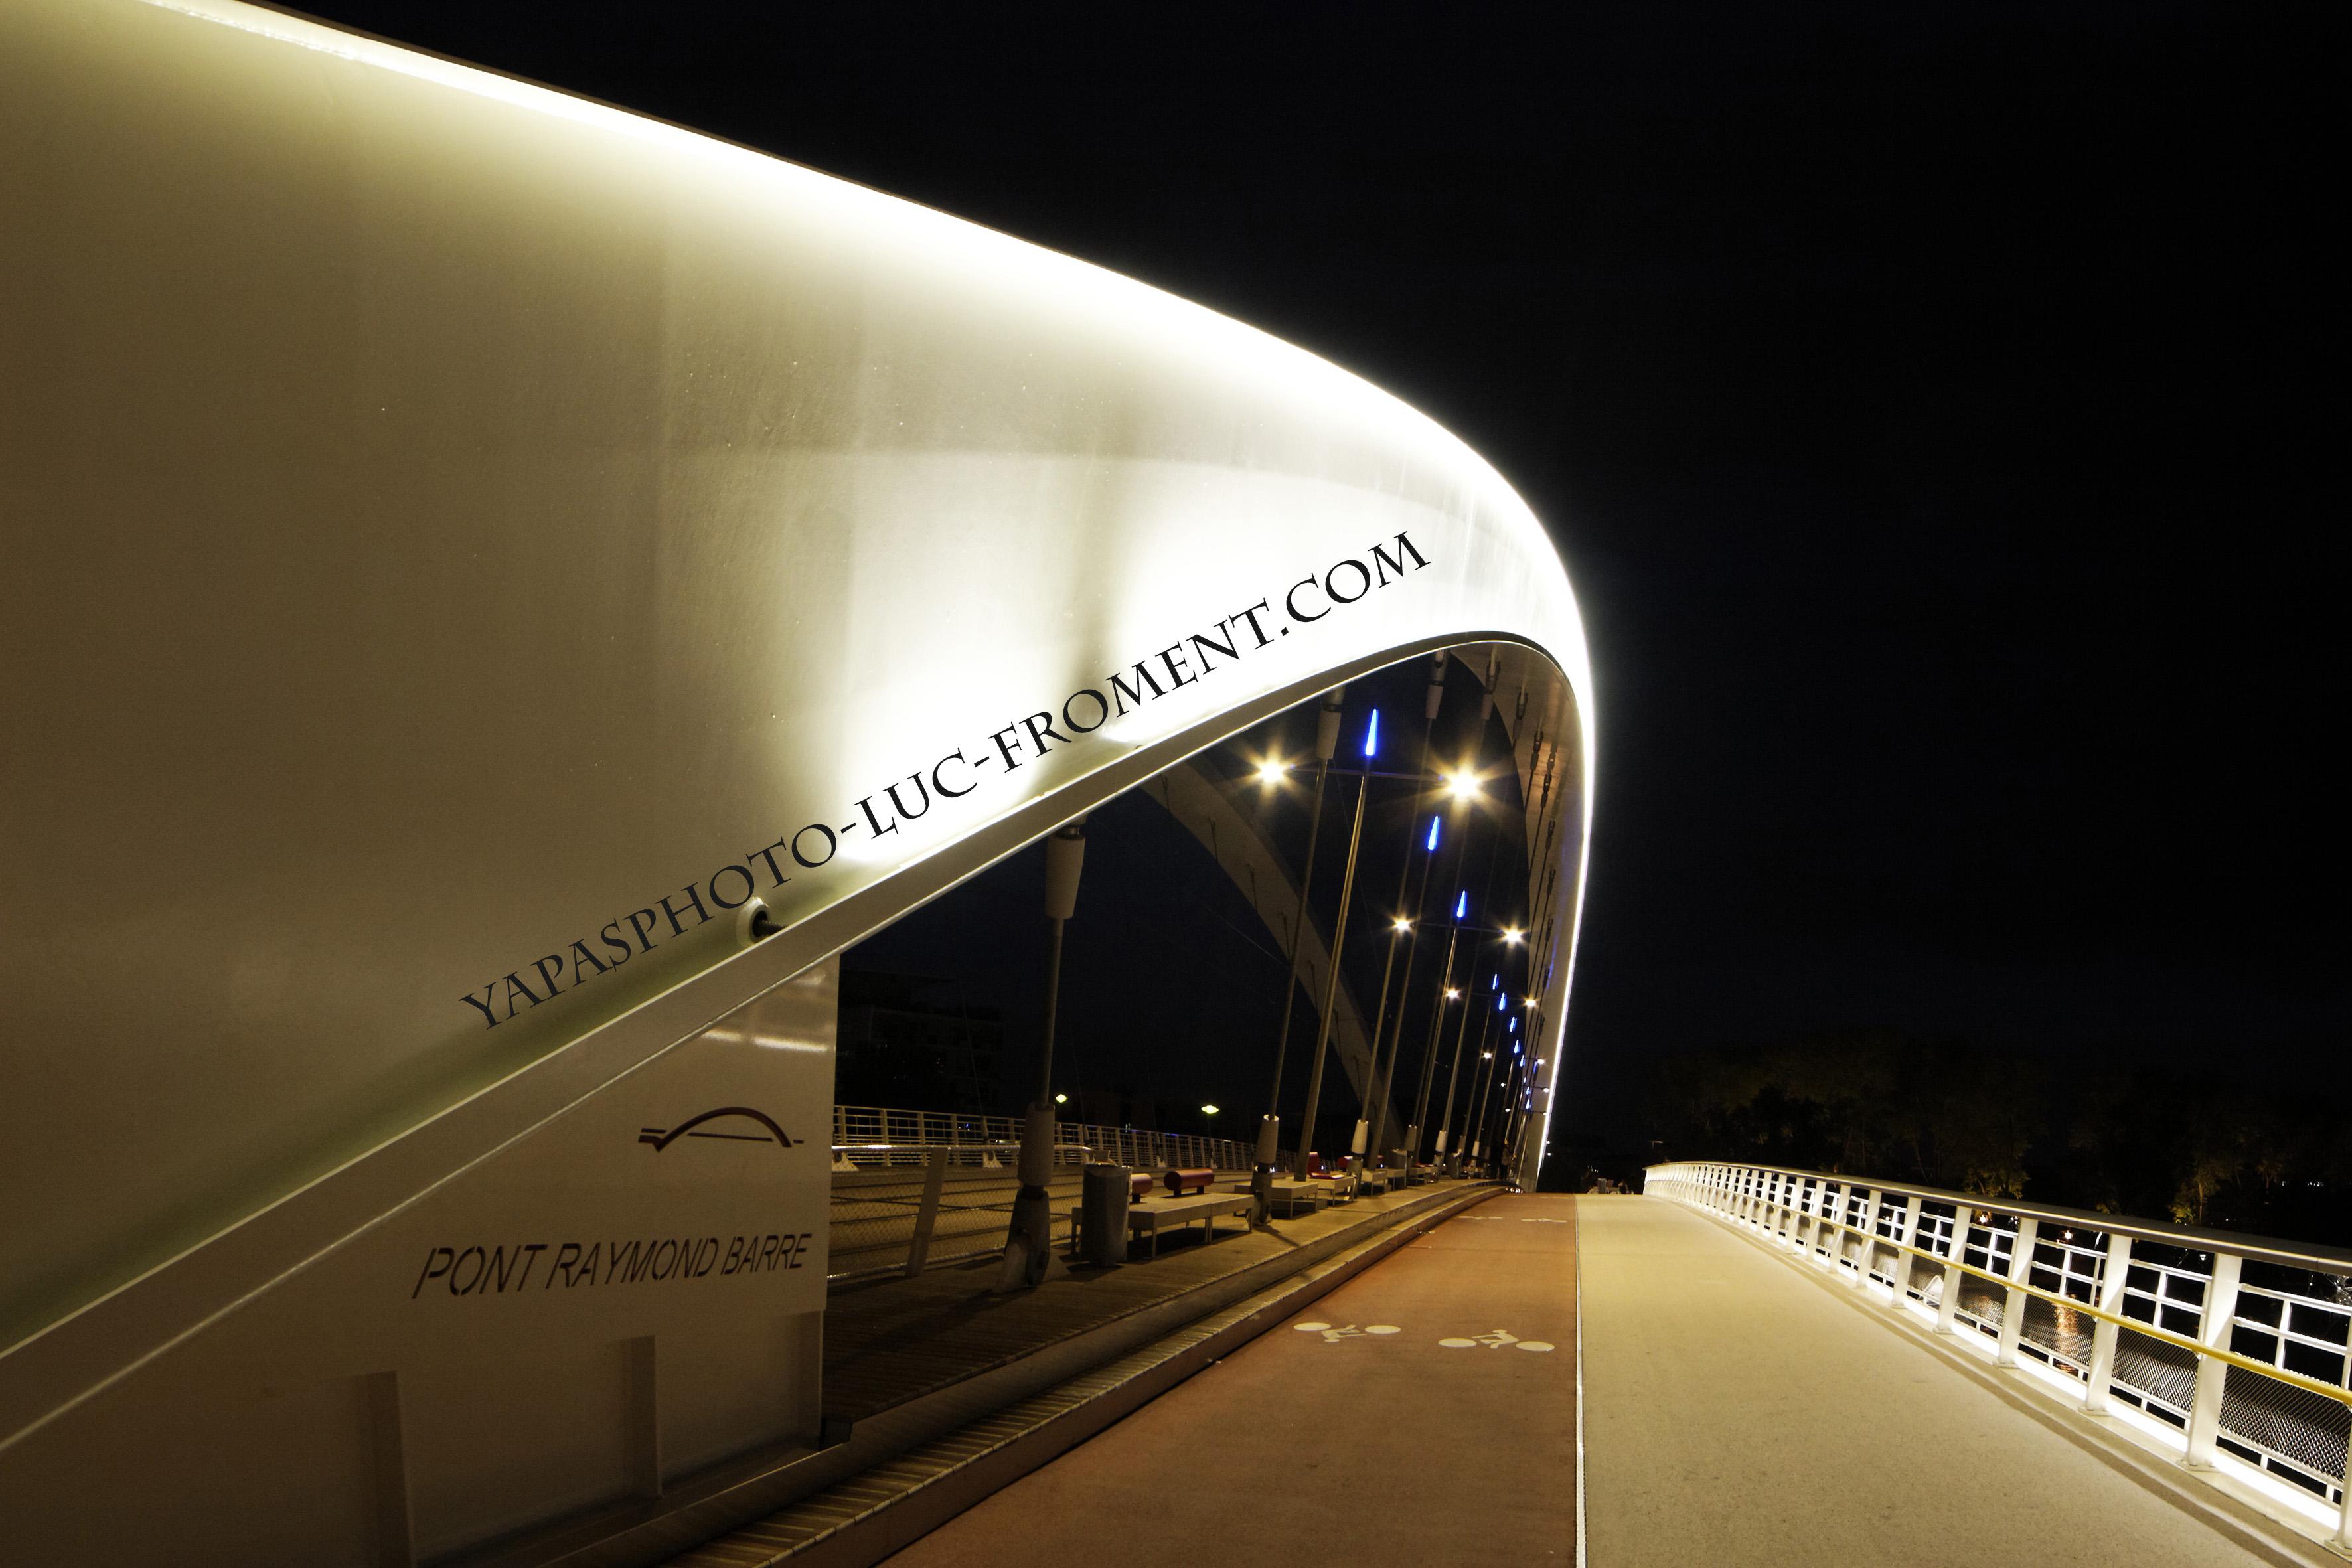 Pont Raymond Barre 1 WM